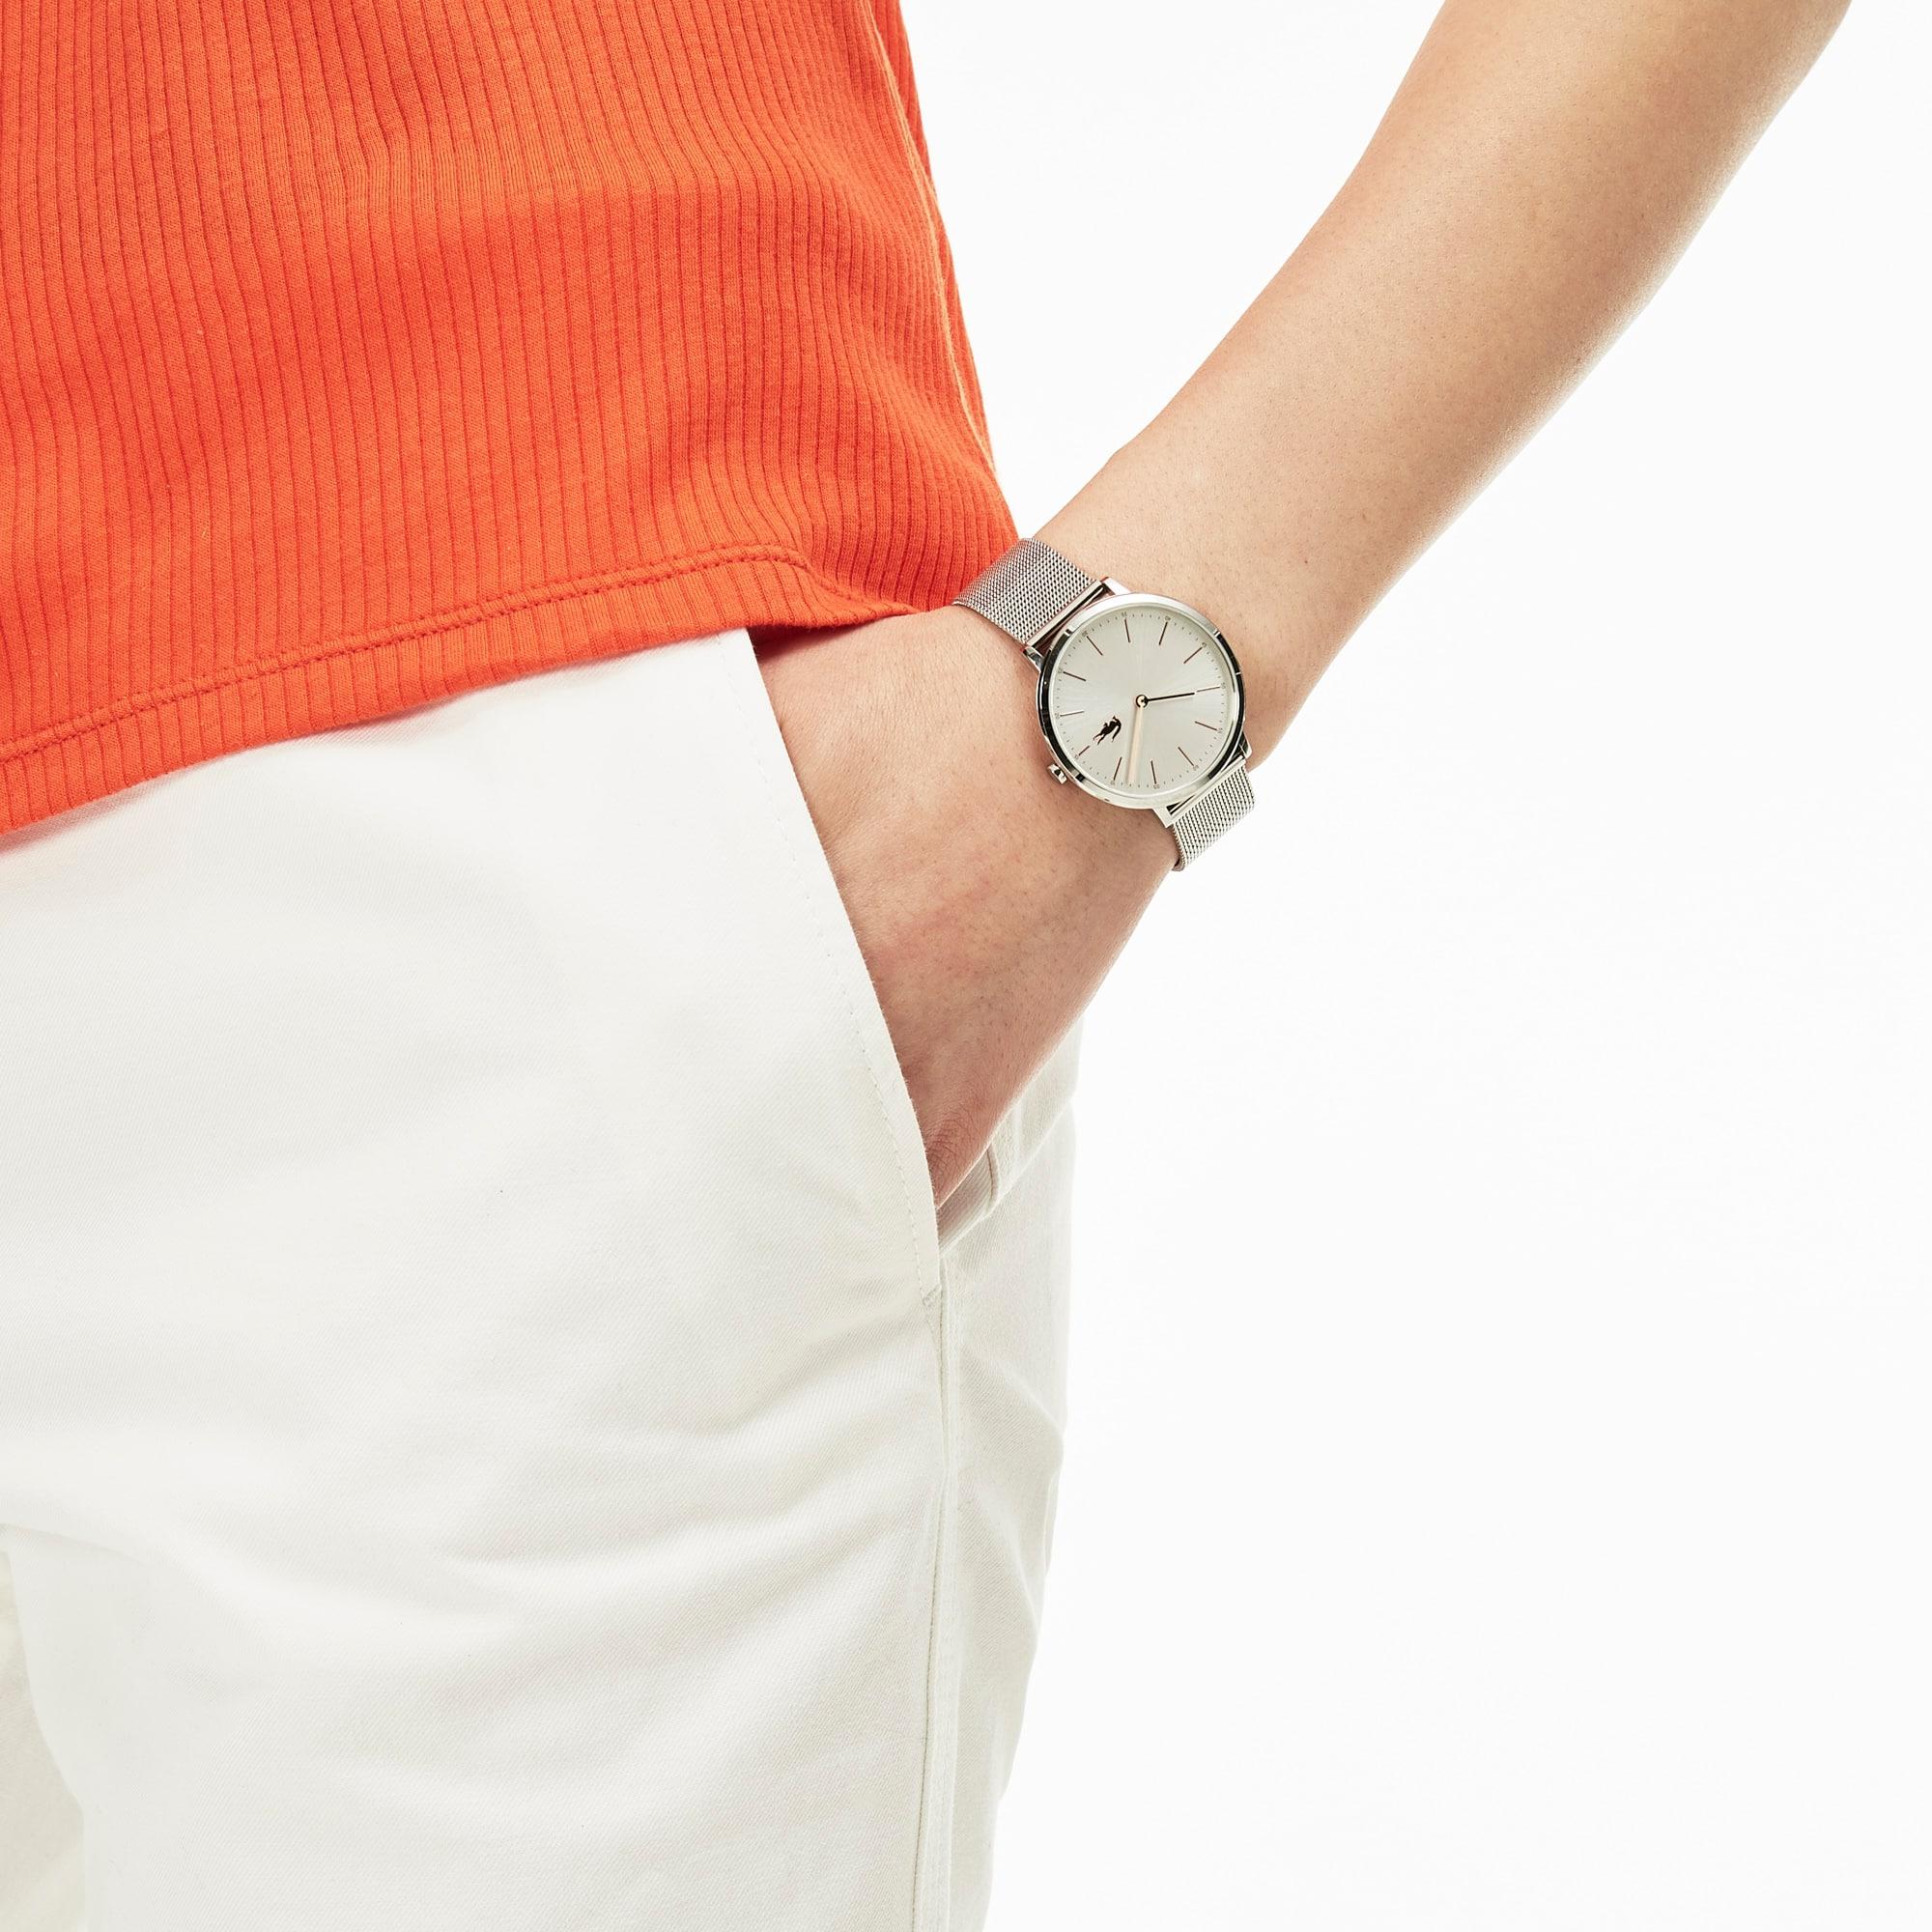 Moon Damenuhr mit Edelstahl-Armband